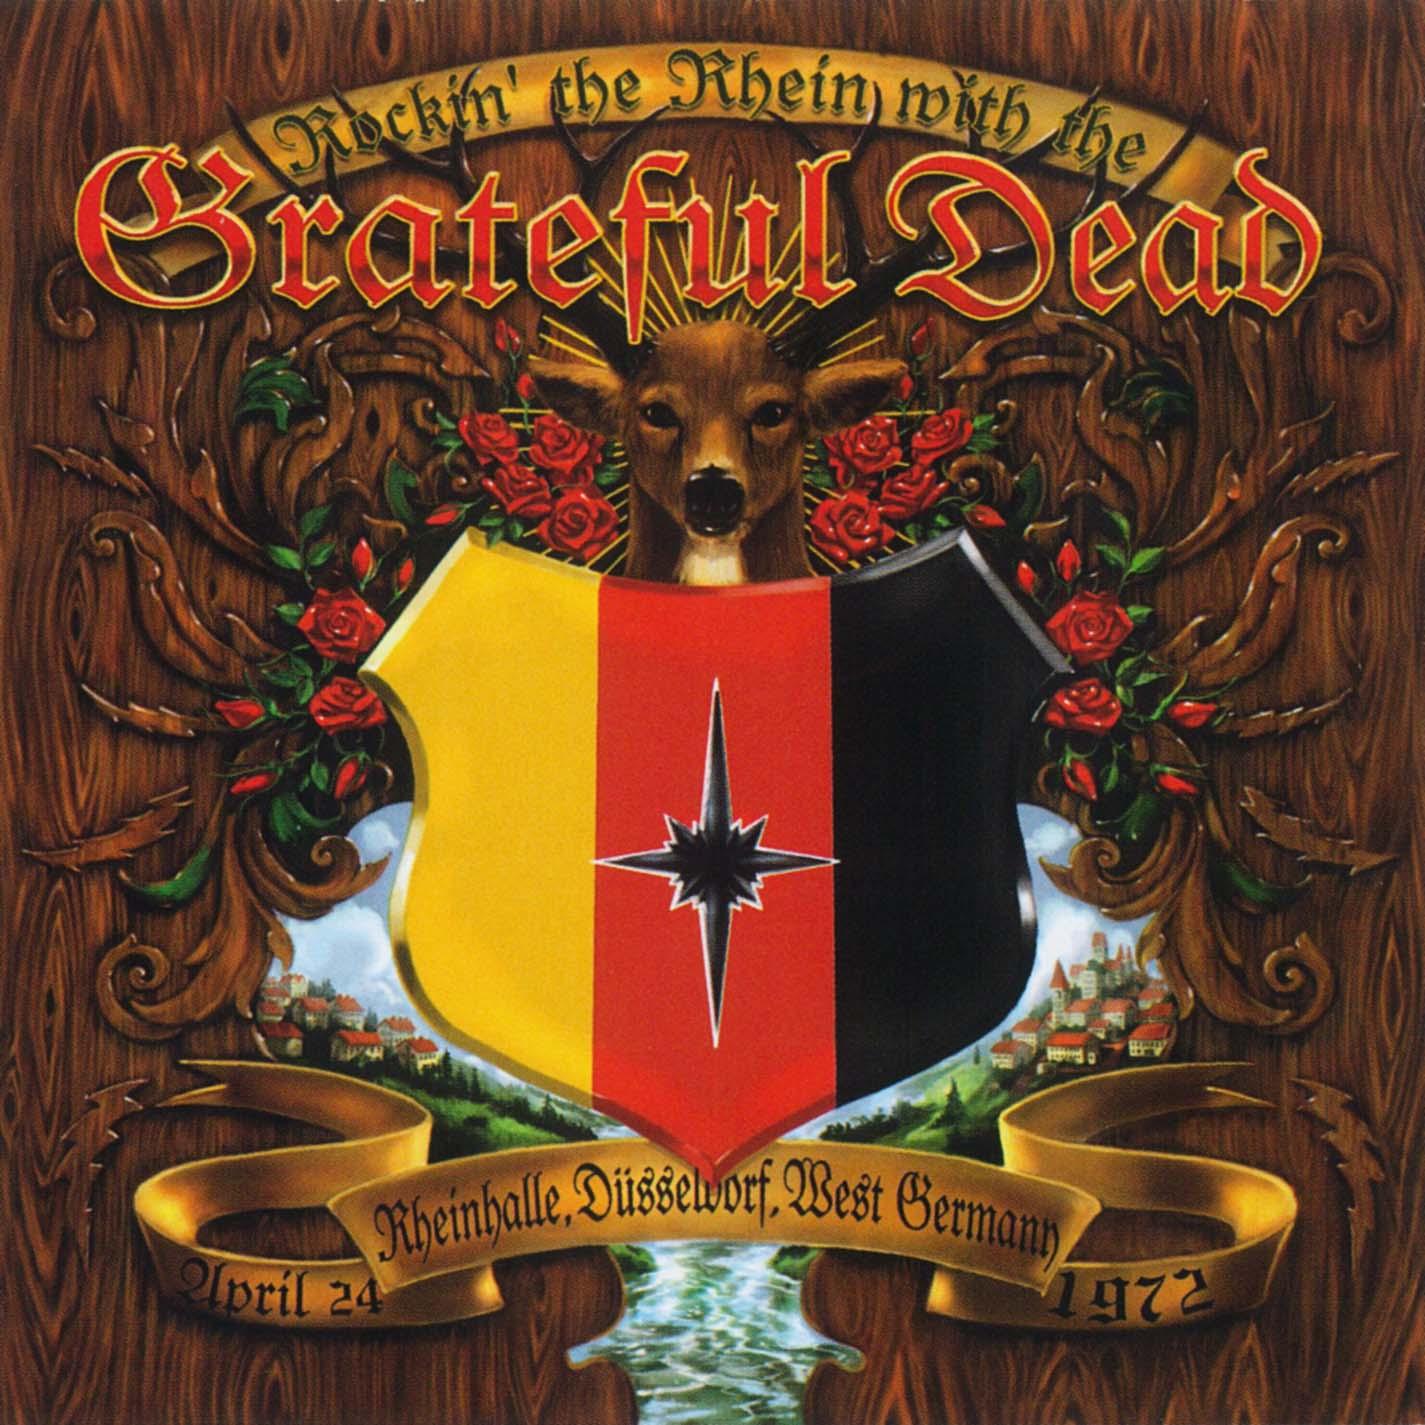 Grateful Dead Rockin' the Rhein album cover artwork